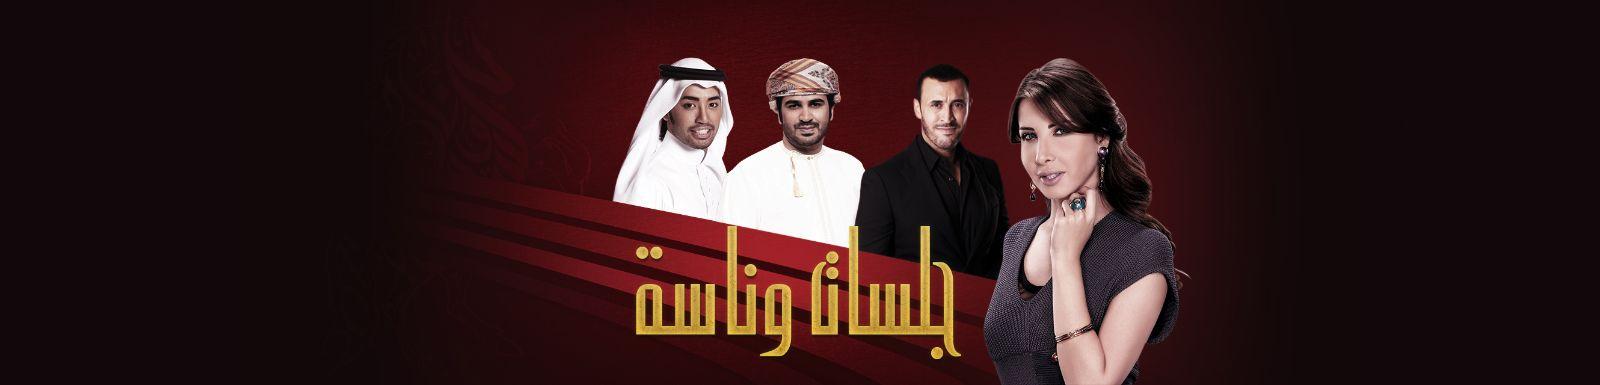 ������ ������ ������ ����� ����� Eid Special 1 ����� 2014